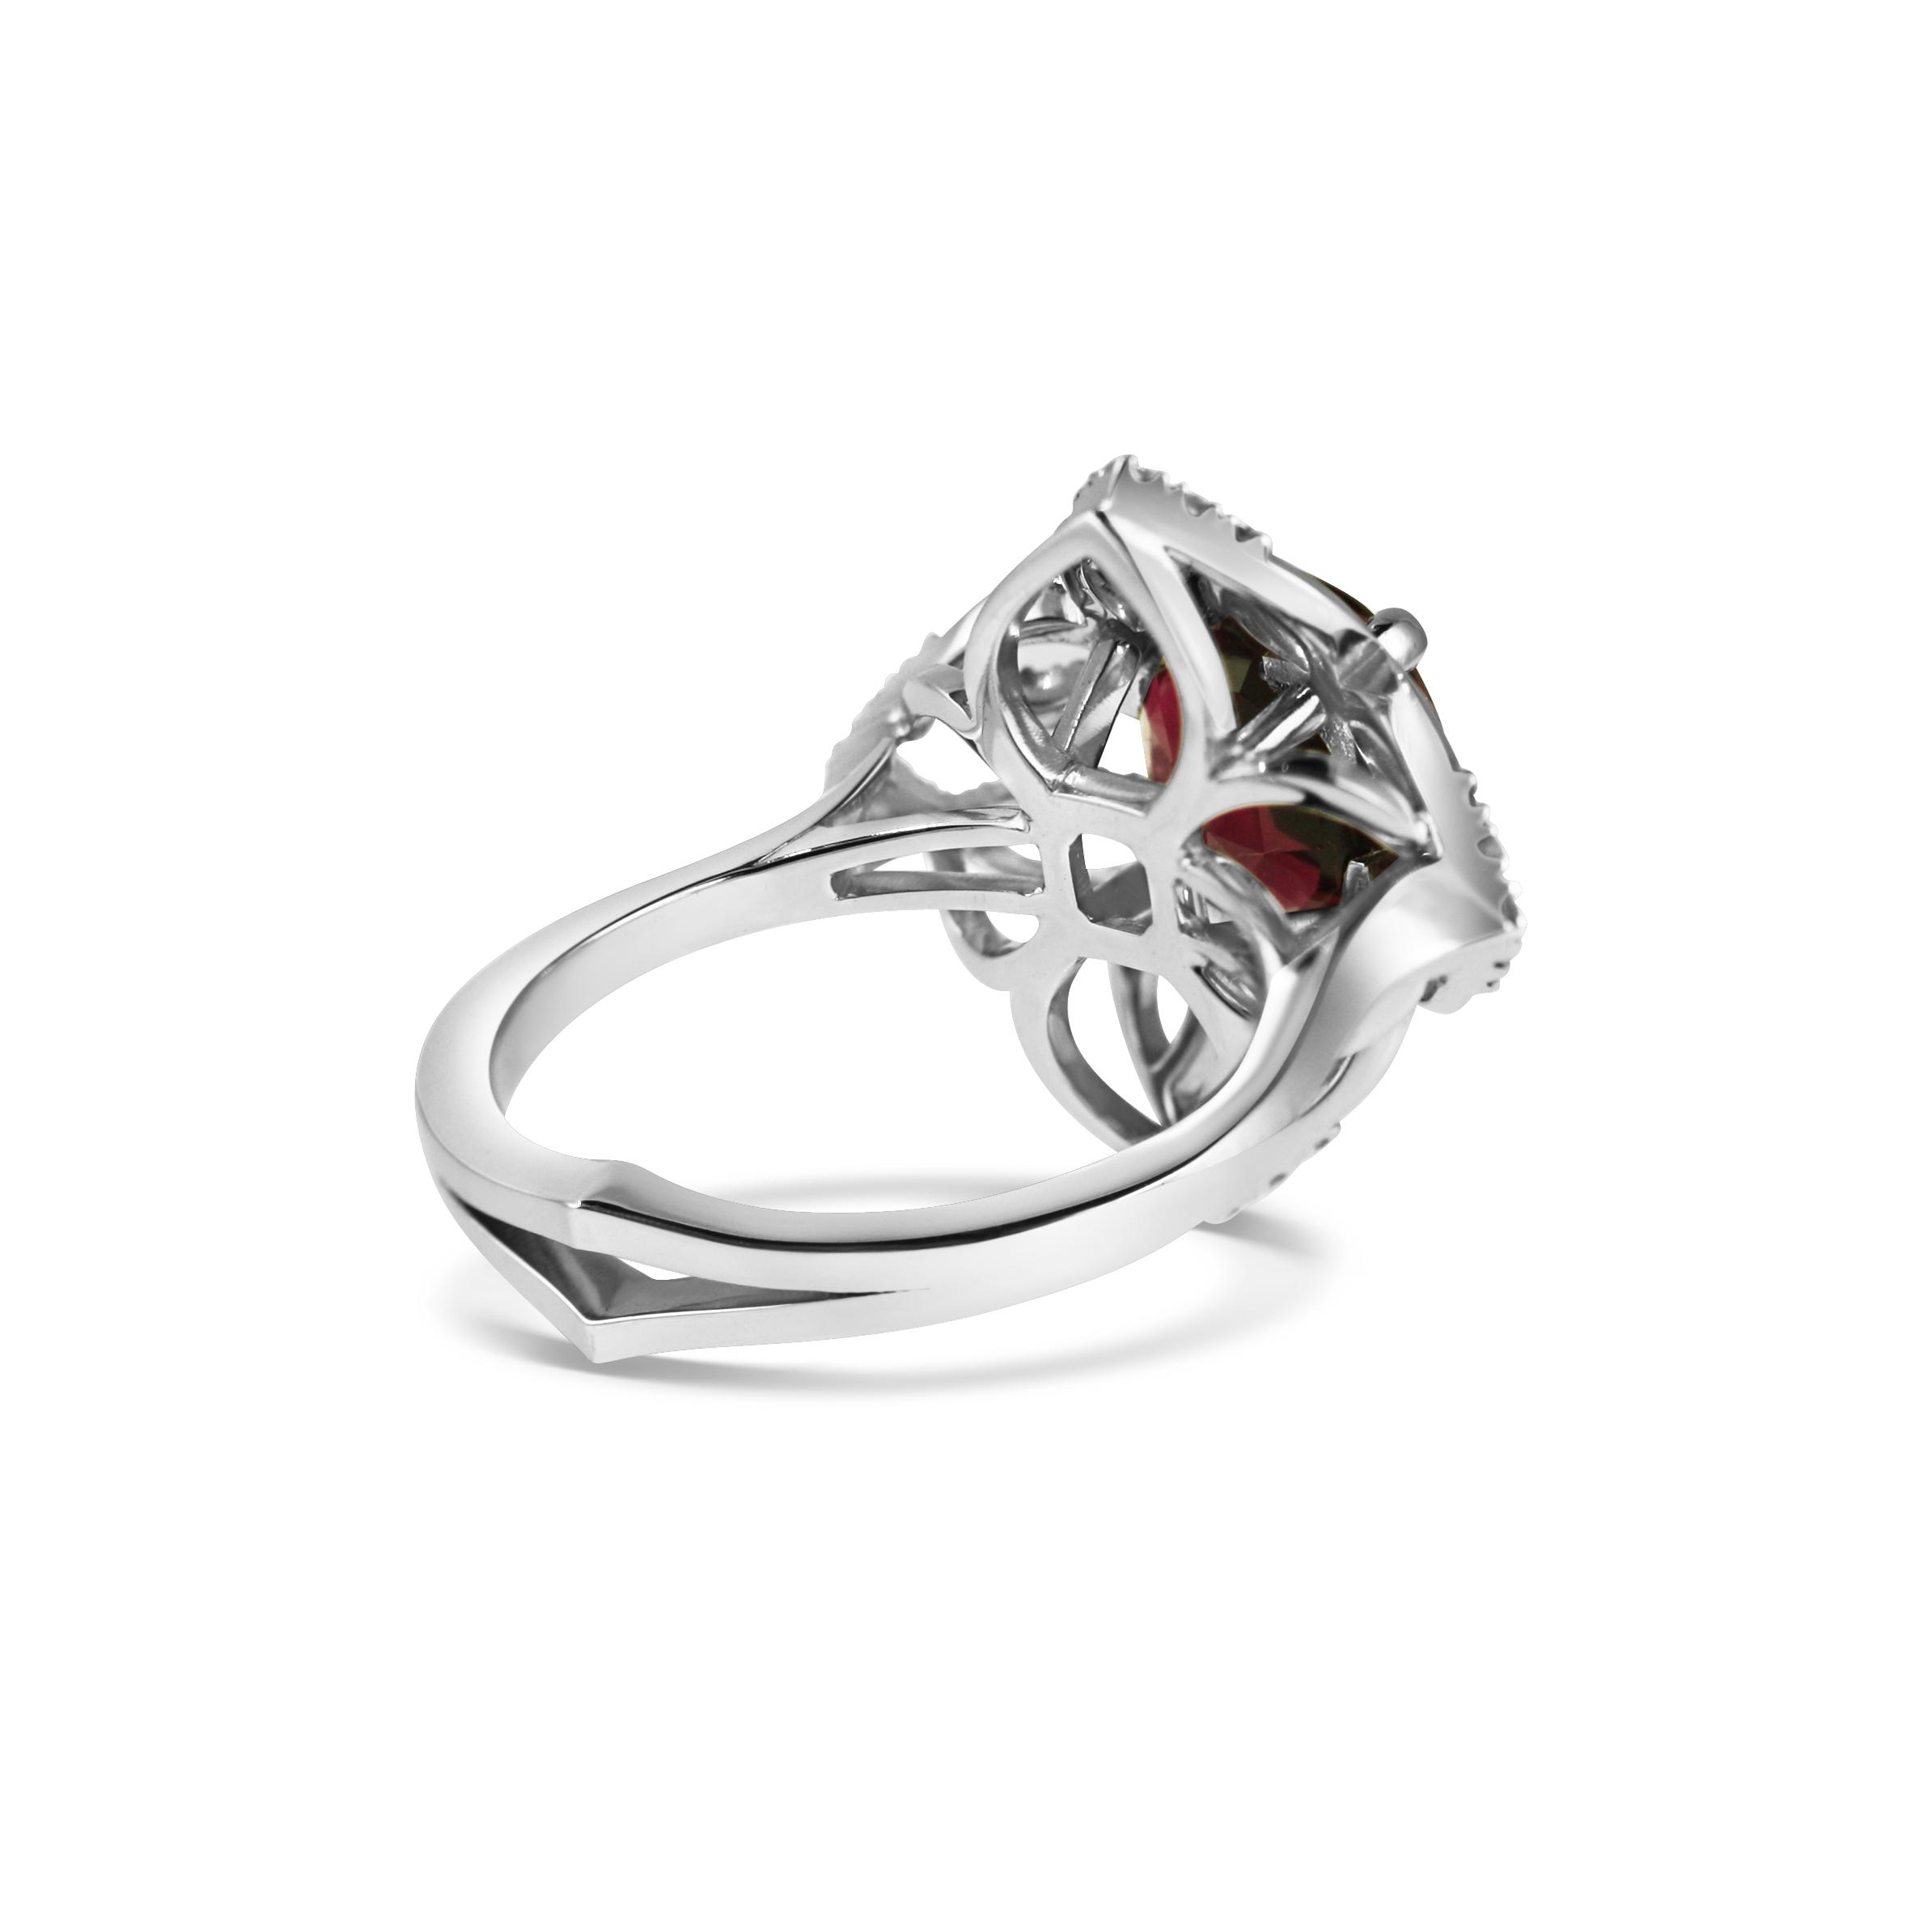 Freya Ring ~ White Gold & Garnet ~ KATA Jewellery Collection